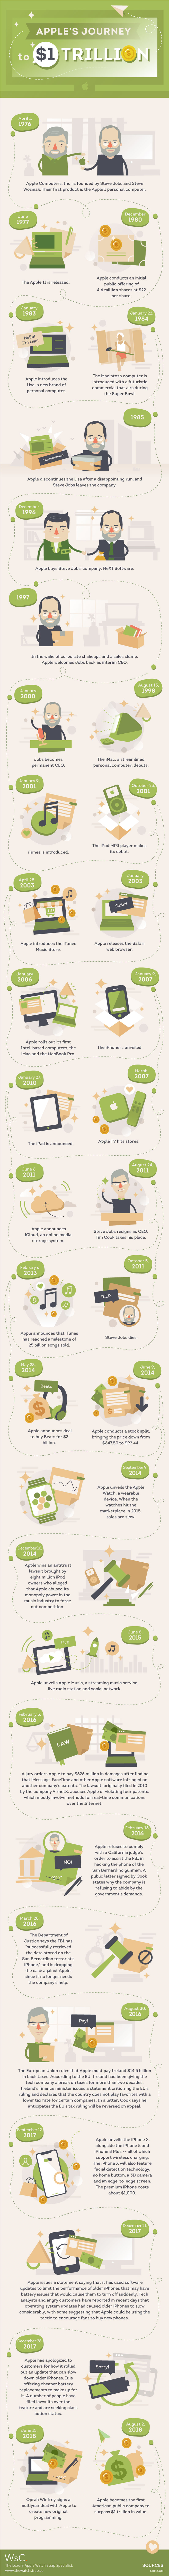 Apple's Journey to $1 Trillion – Infographic